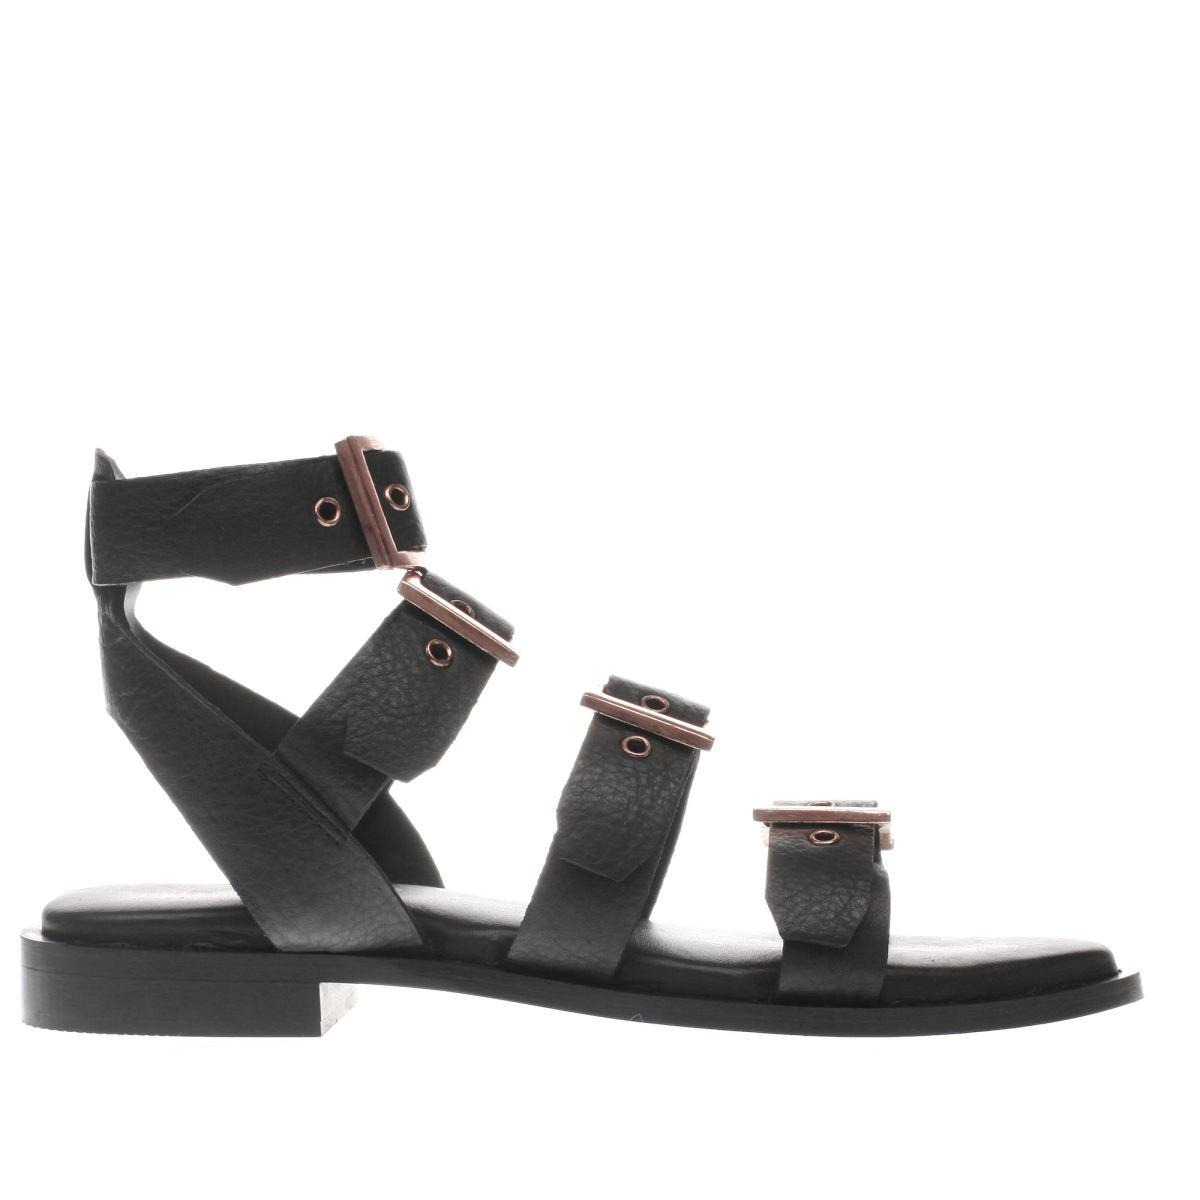 schuh black vegas sandals